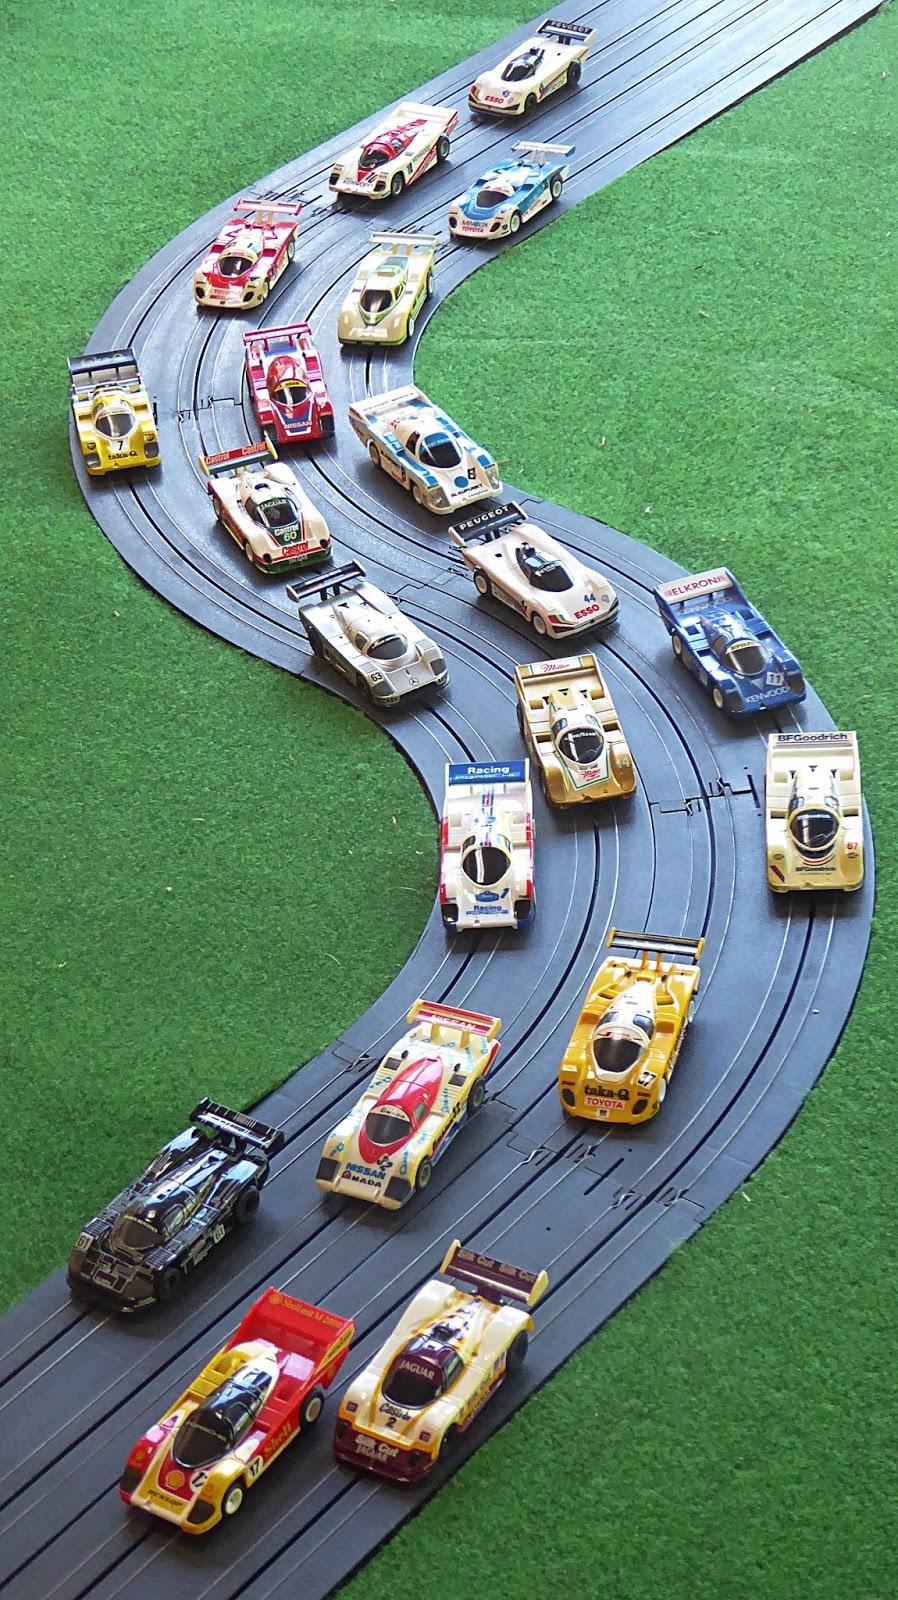 Group C Slot Car Racing